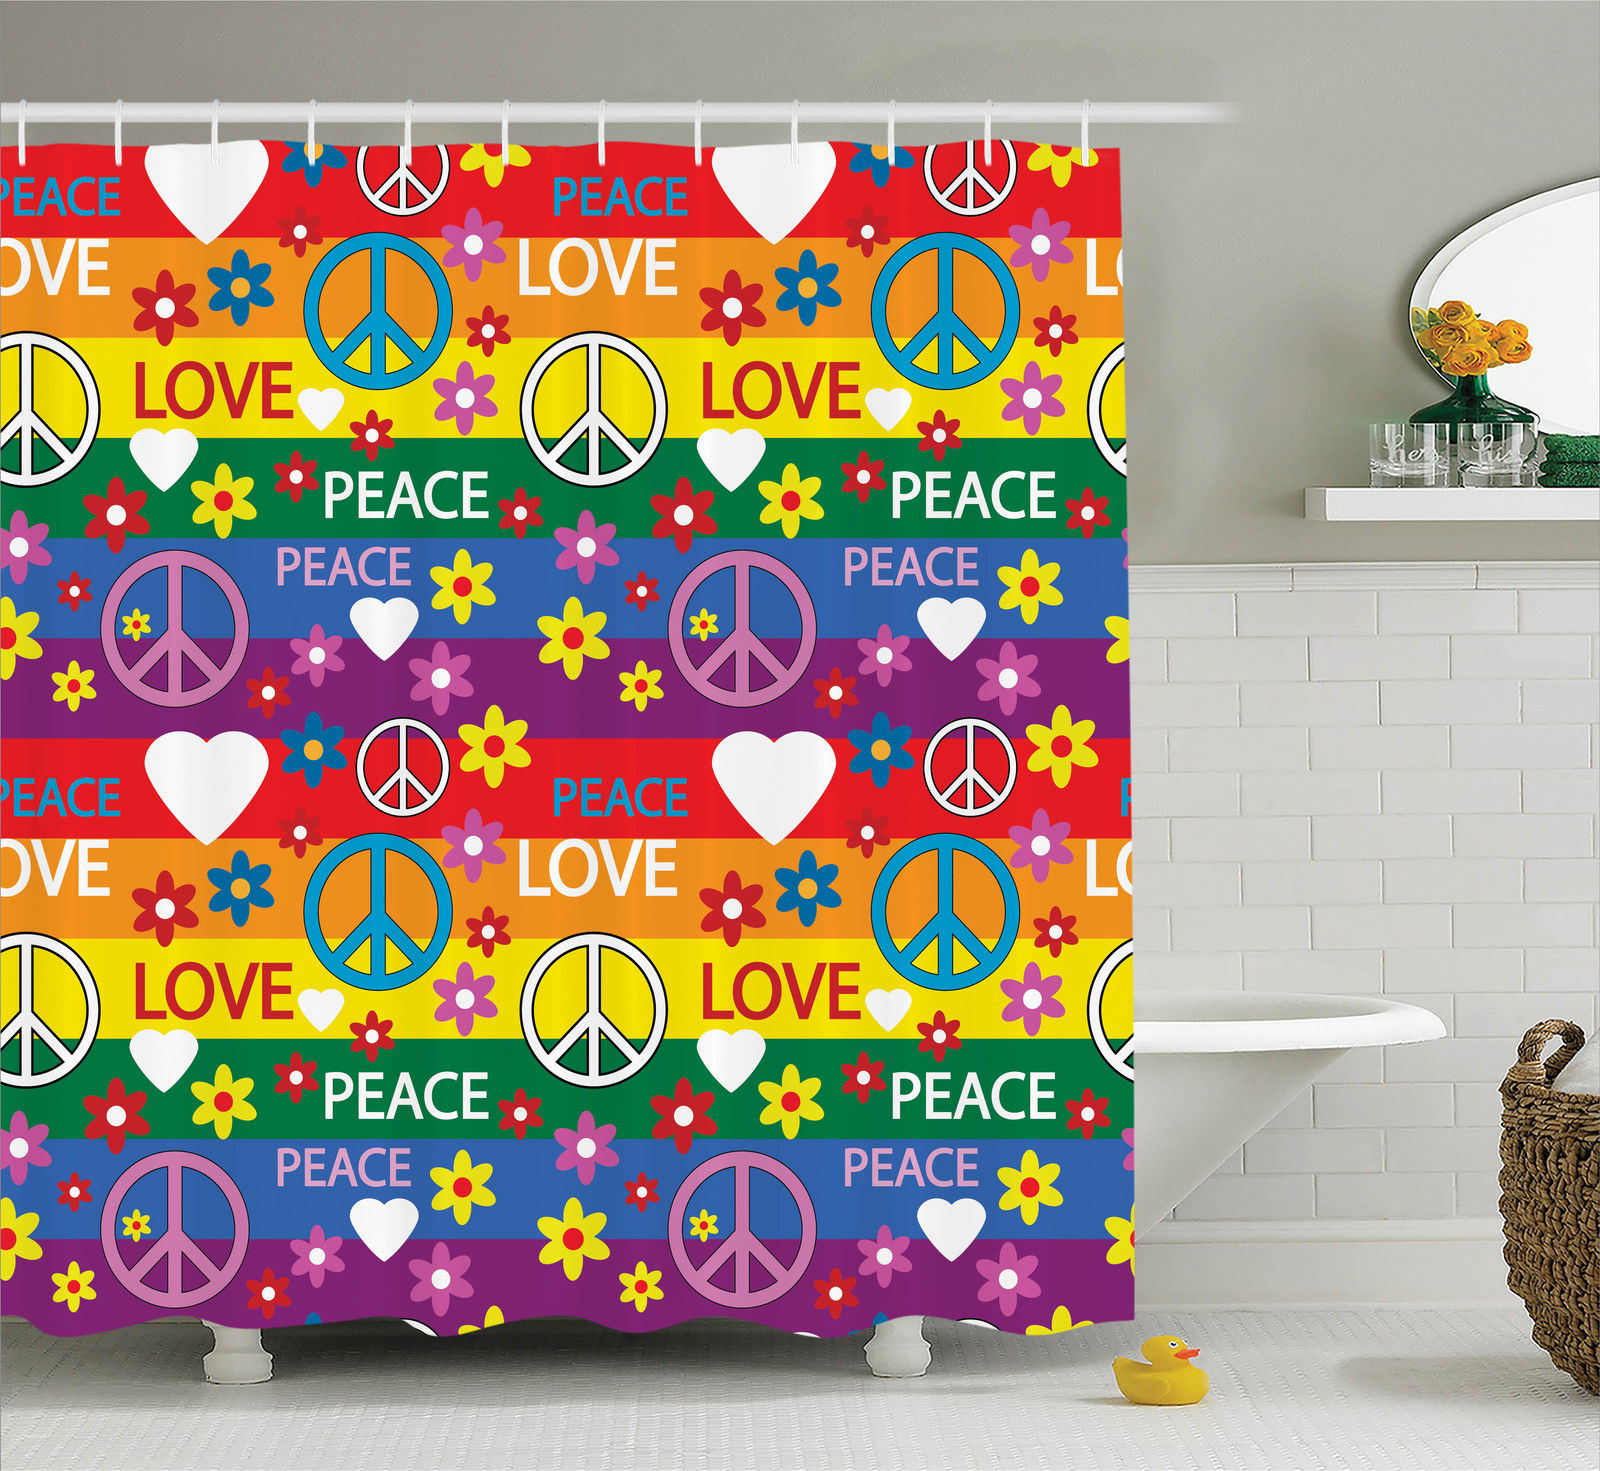 Groovy Decorations Shower Curtain Set Heart Peace Symbol Flower